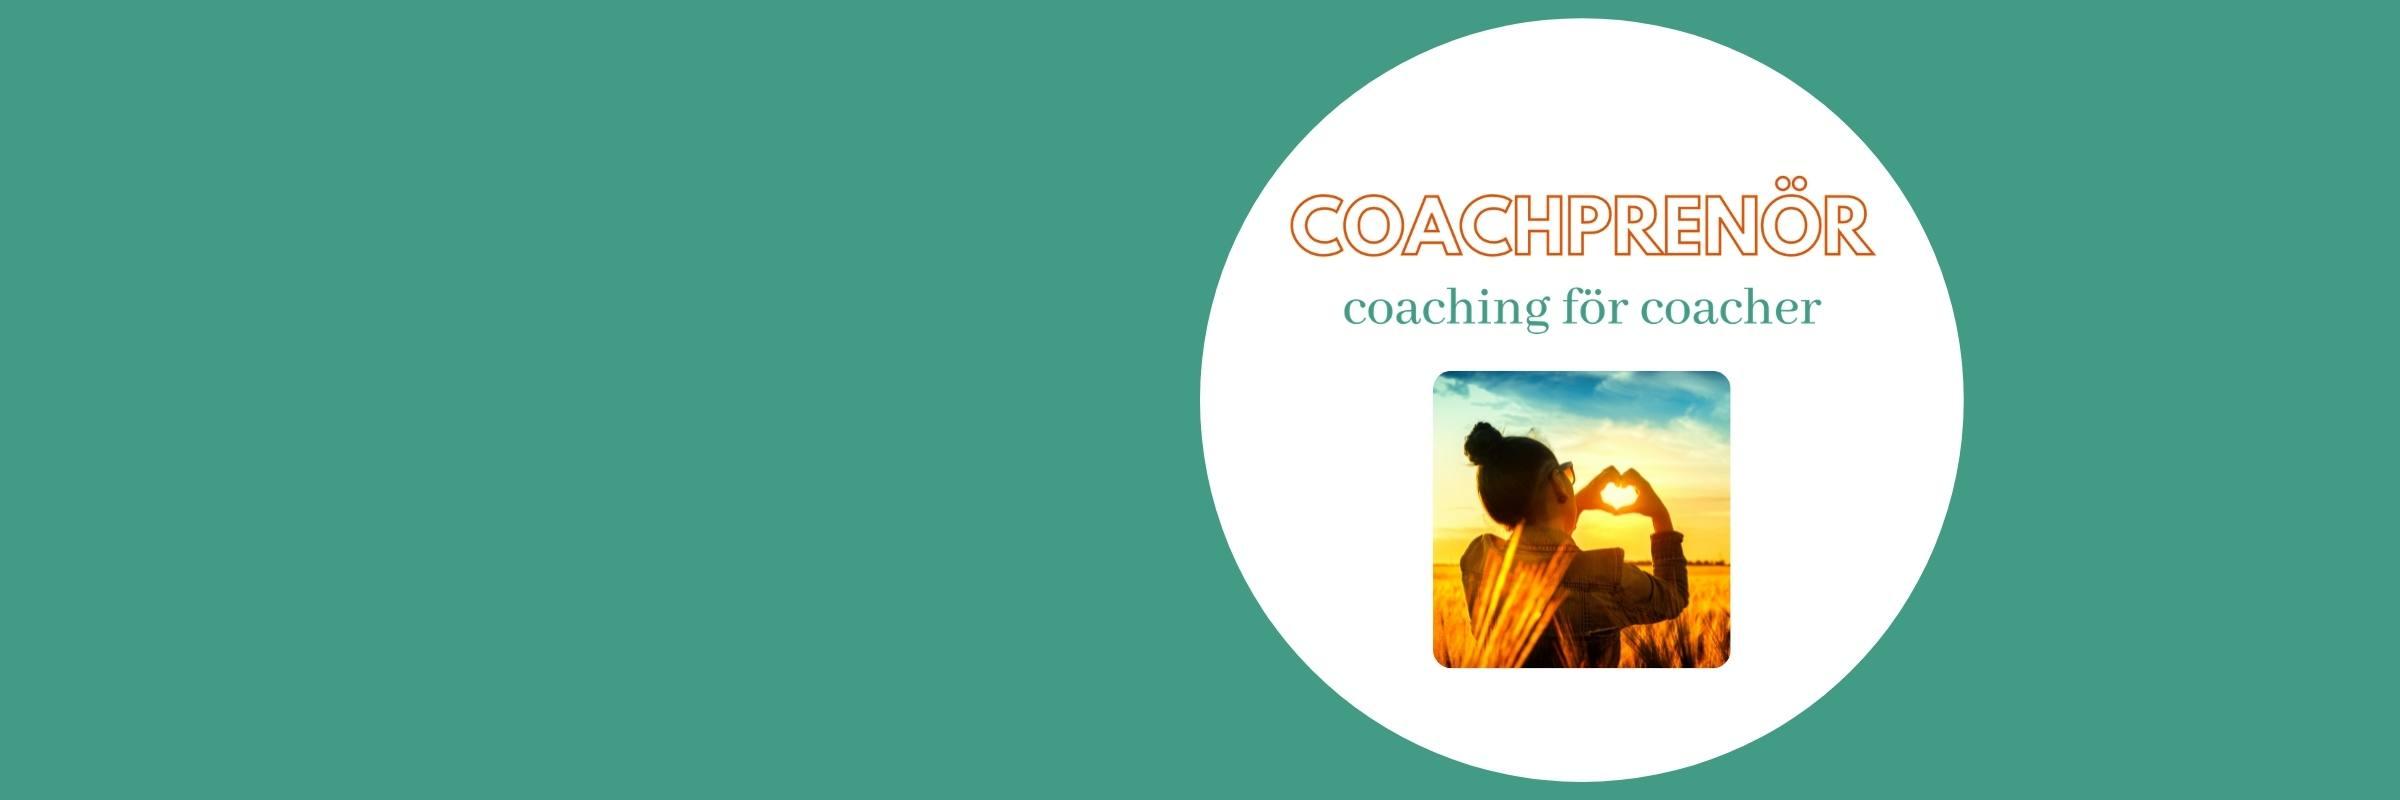 Coachprenör - coaching för coacher Kicki Westerberg